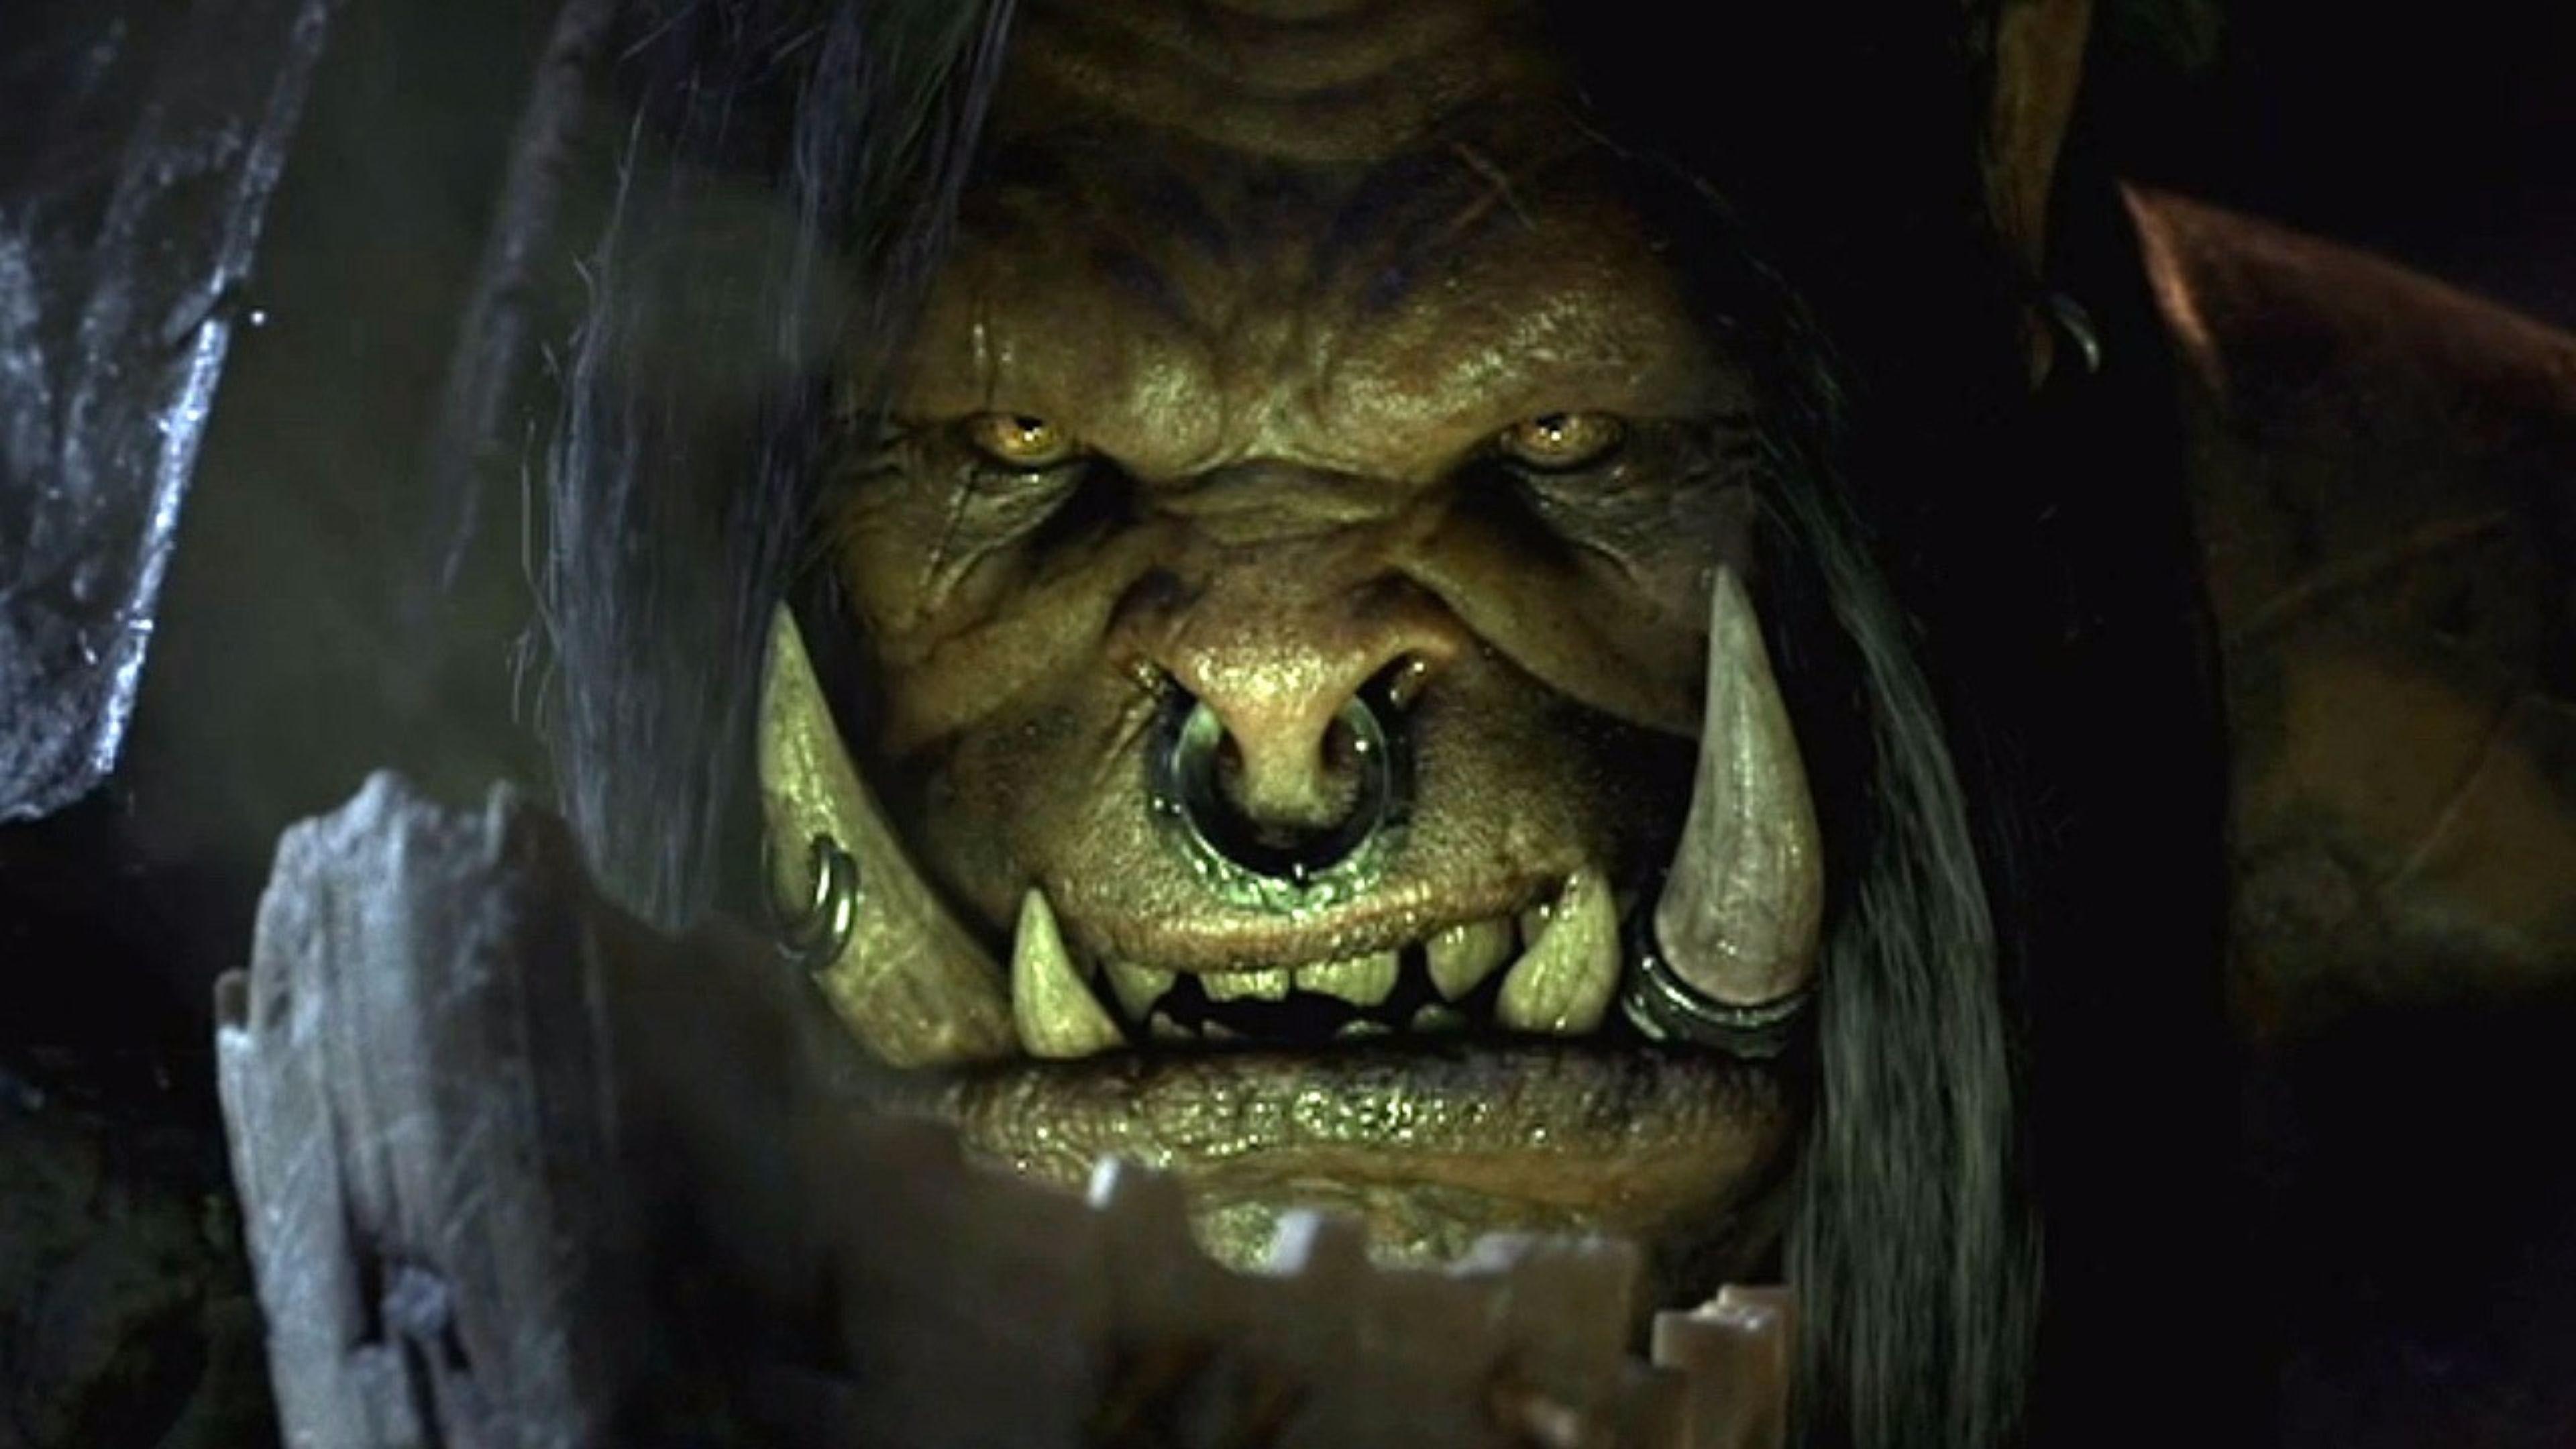 Launch Reveal World of Warcraft Movie 4K Wallpaper 4K Wallpaper 3840x2160